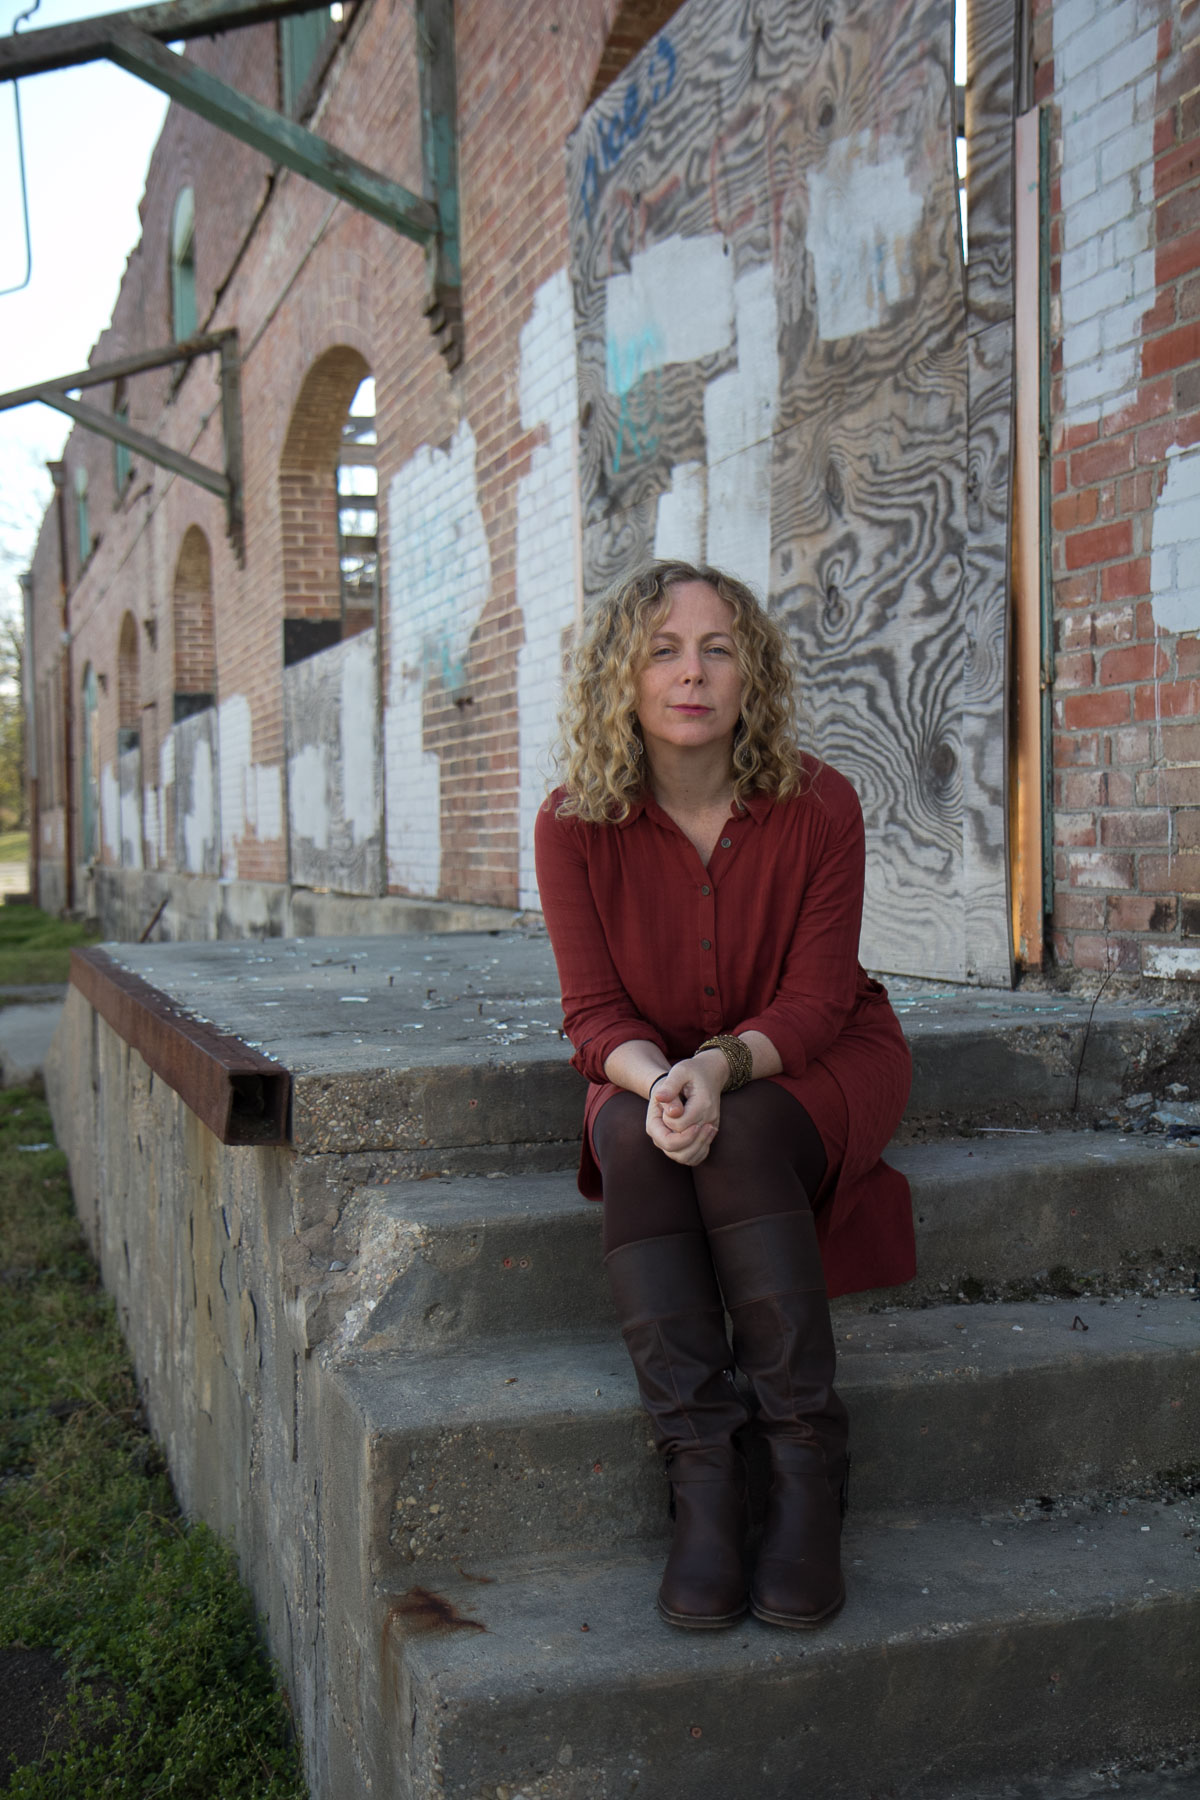 Photo by Betty Press